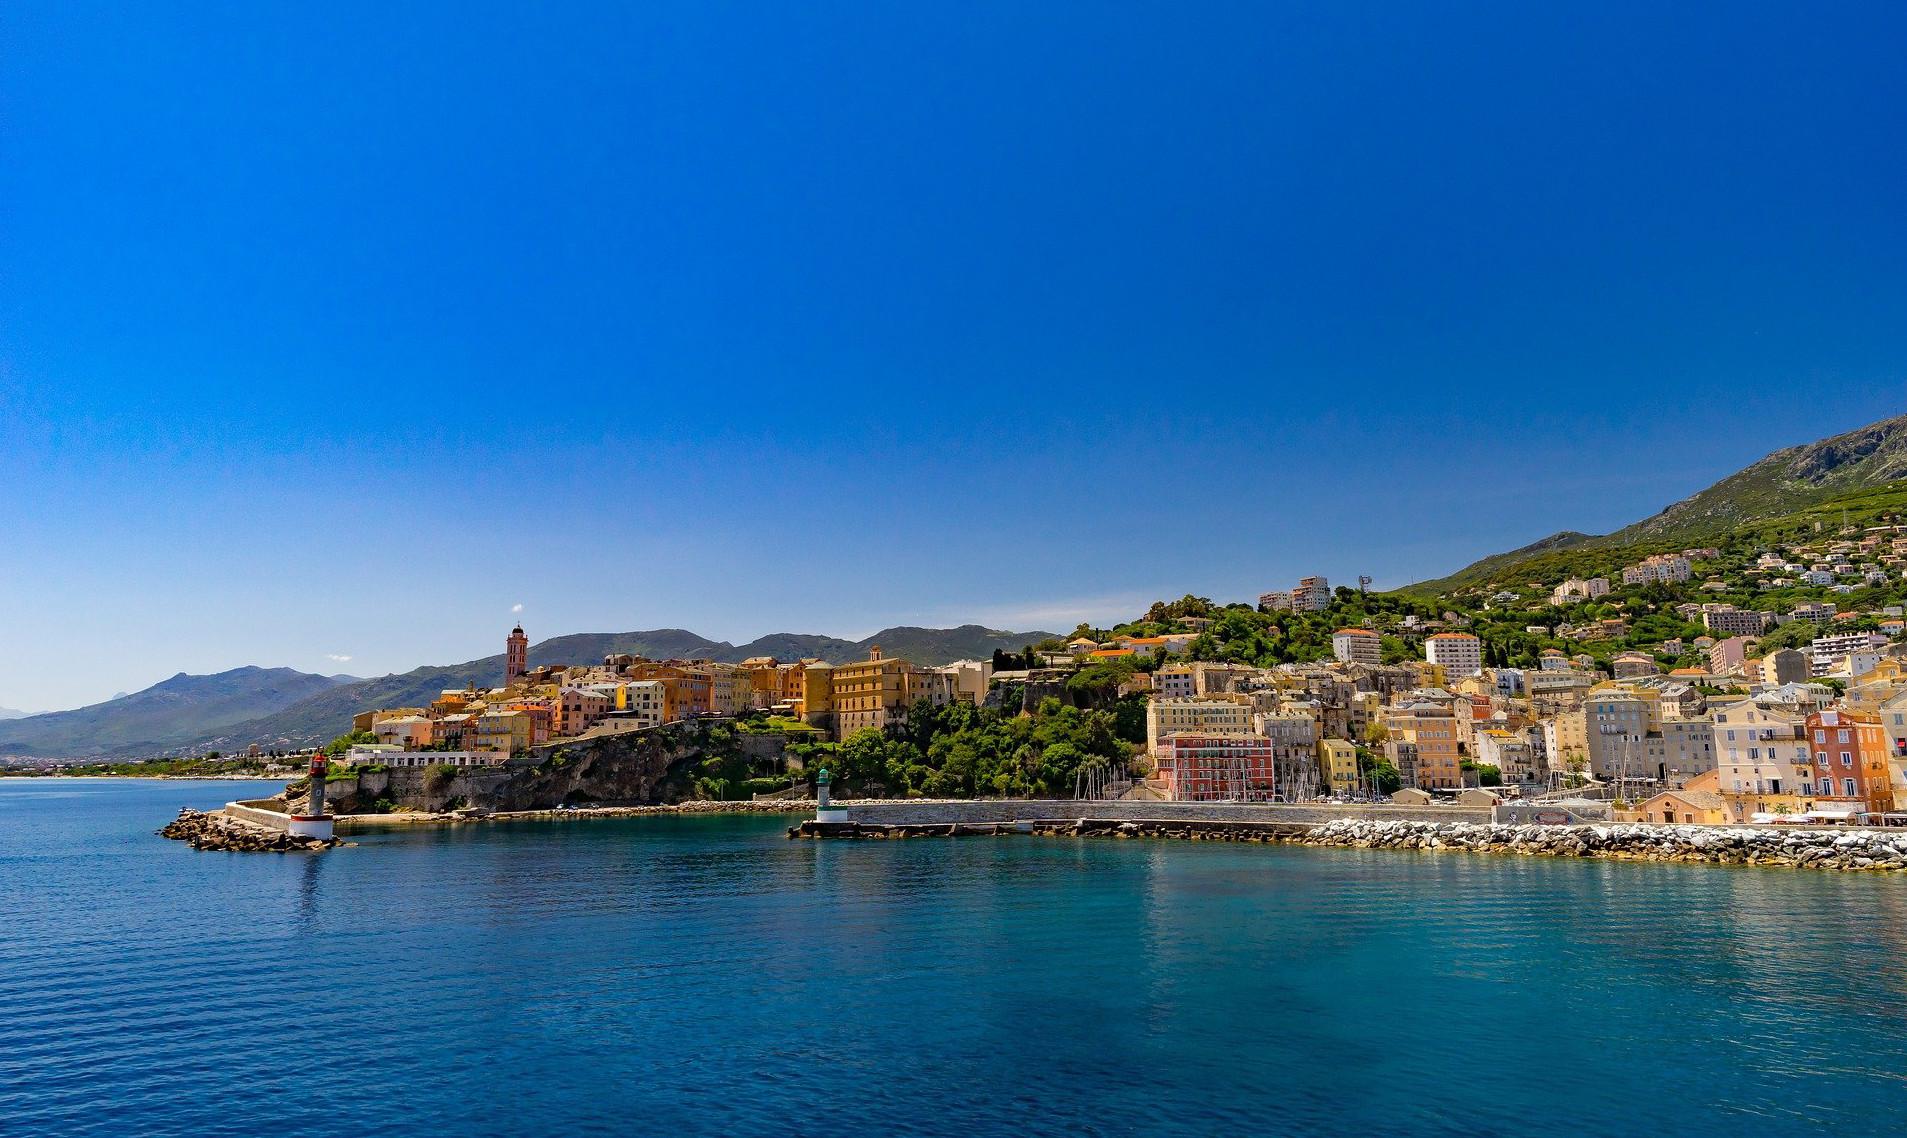 news-main-cunard-announces-return-to-mediterranean-cruises-and-overnight-european-stays.1601457677.jpg